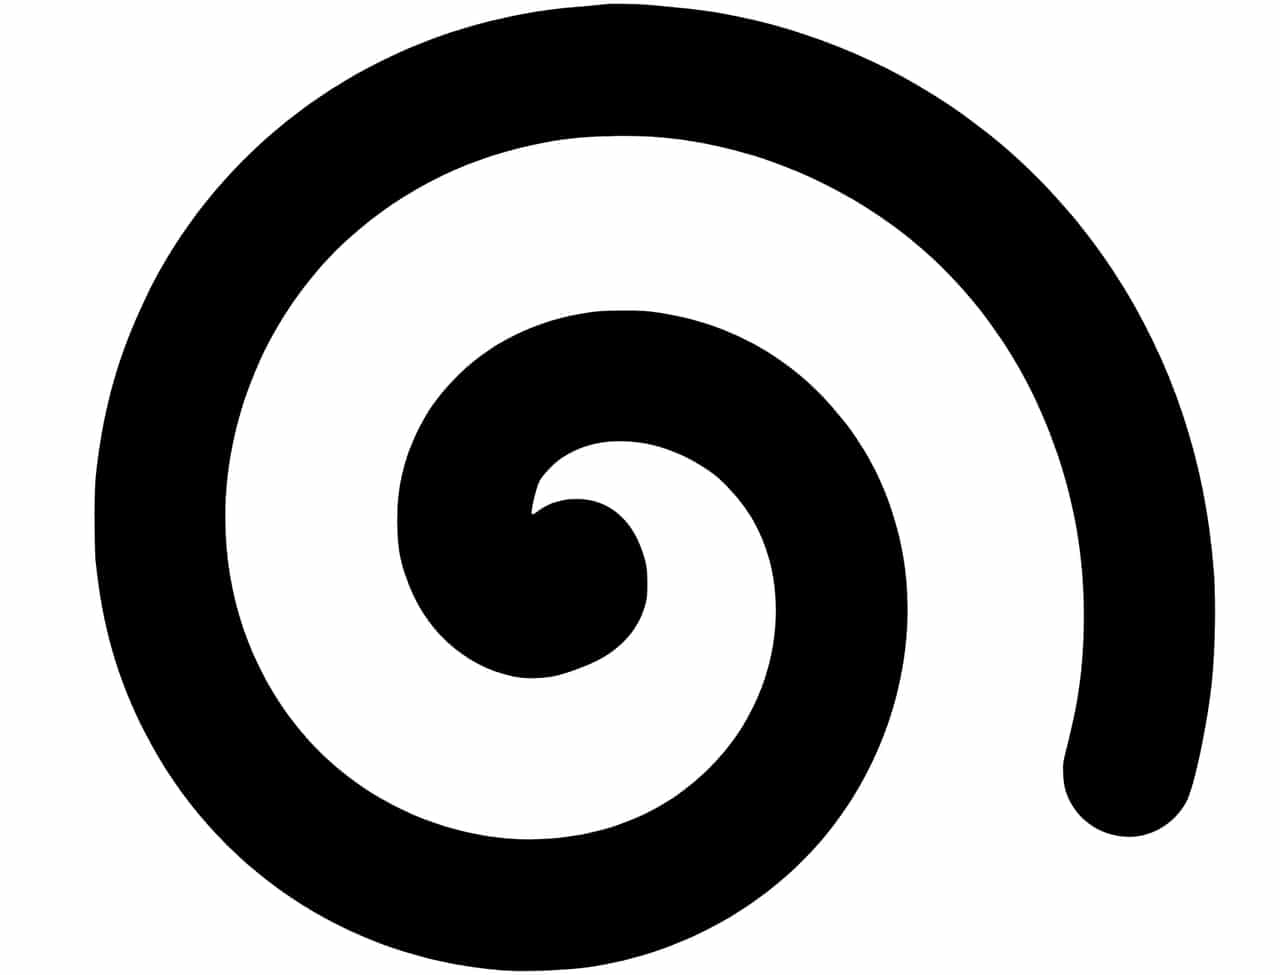 simbolo resiliencia